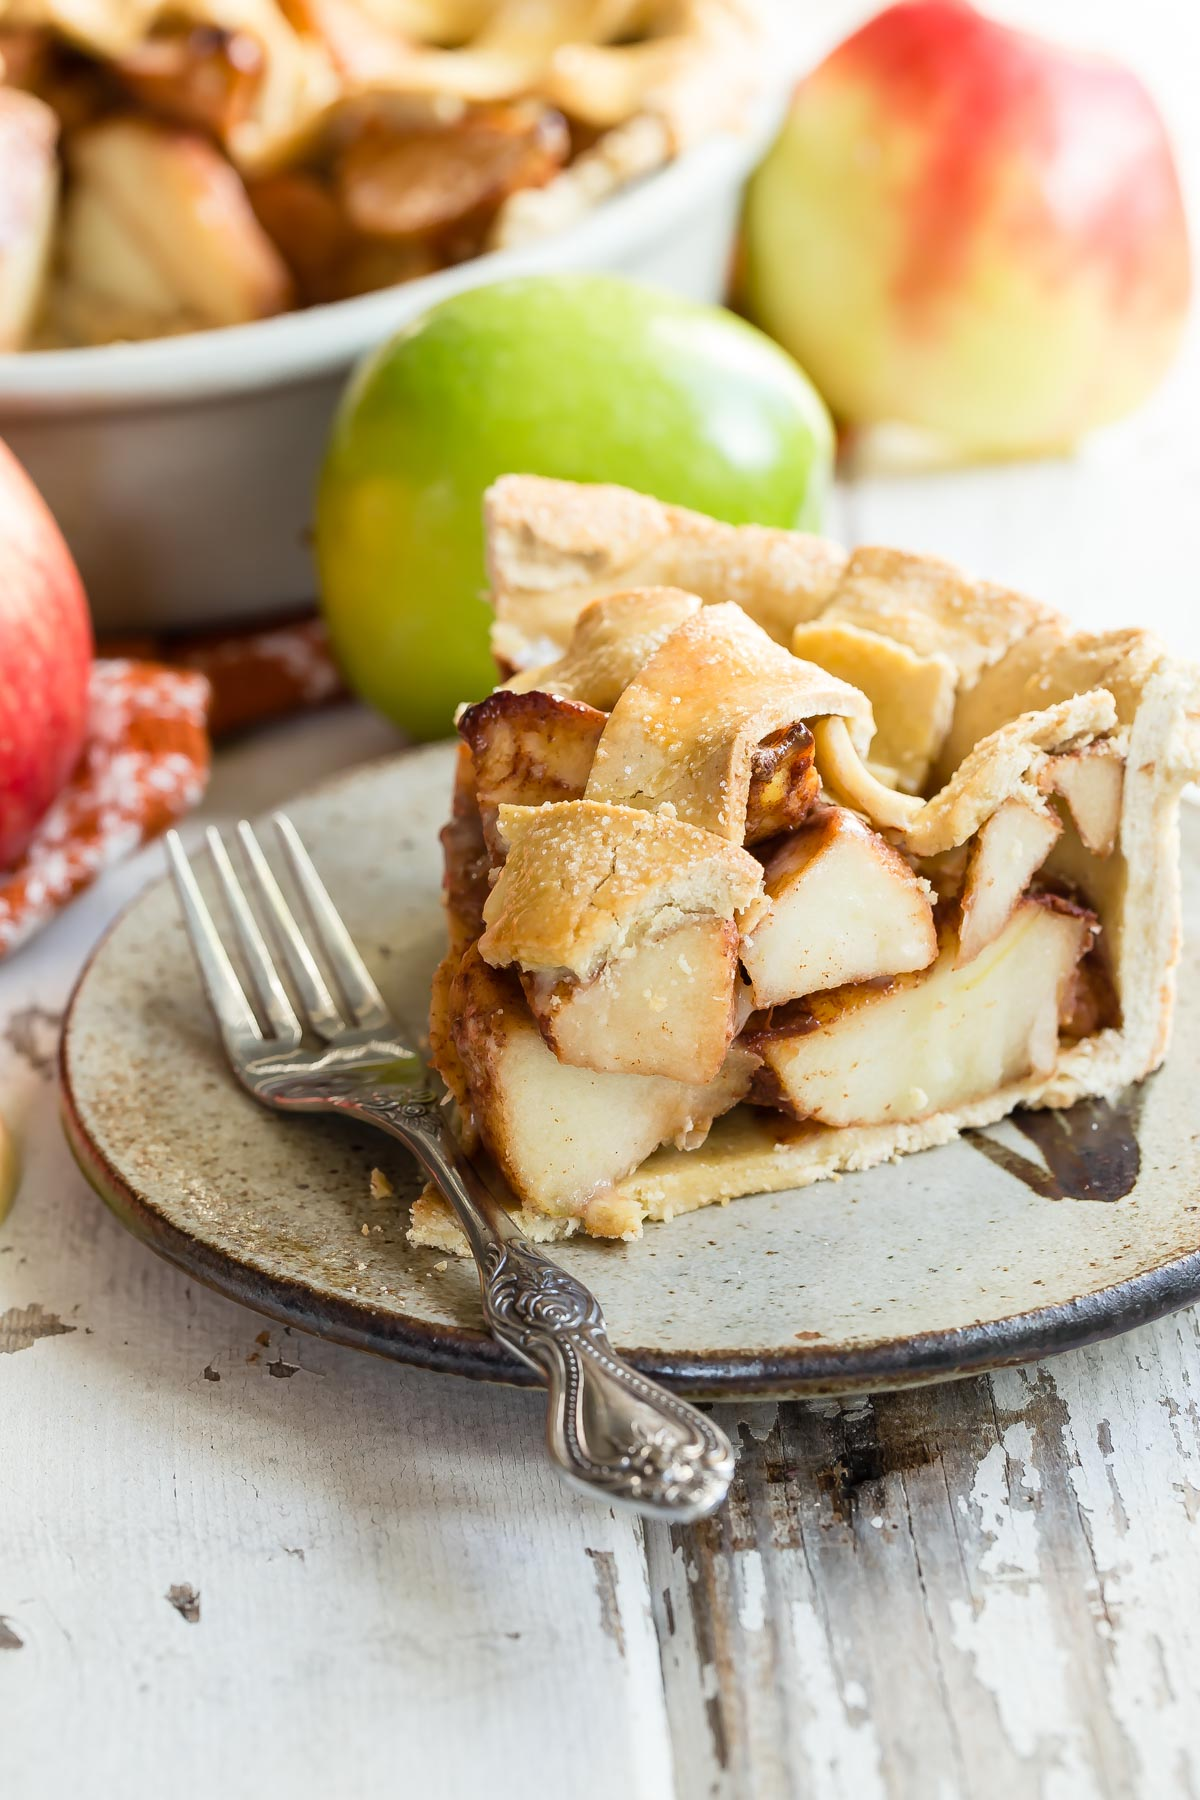 Gluten Free Apple Pie from weelicious.com